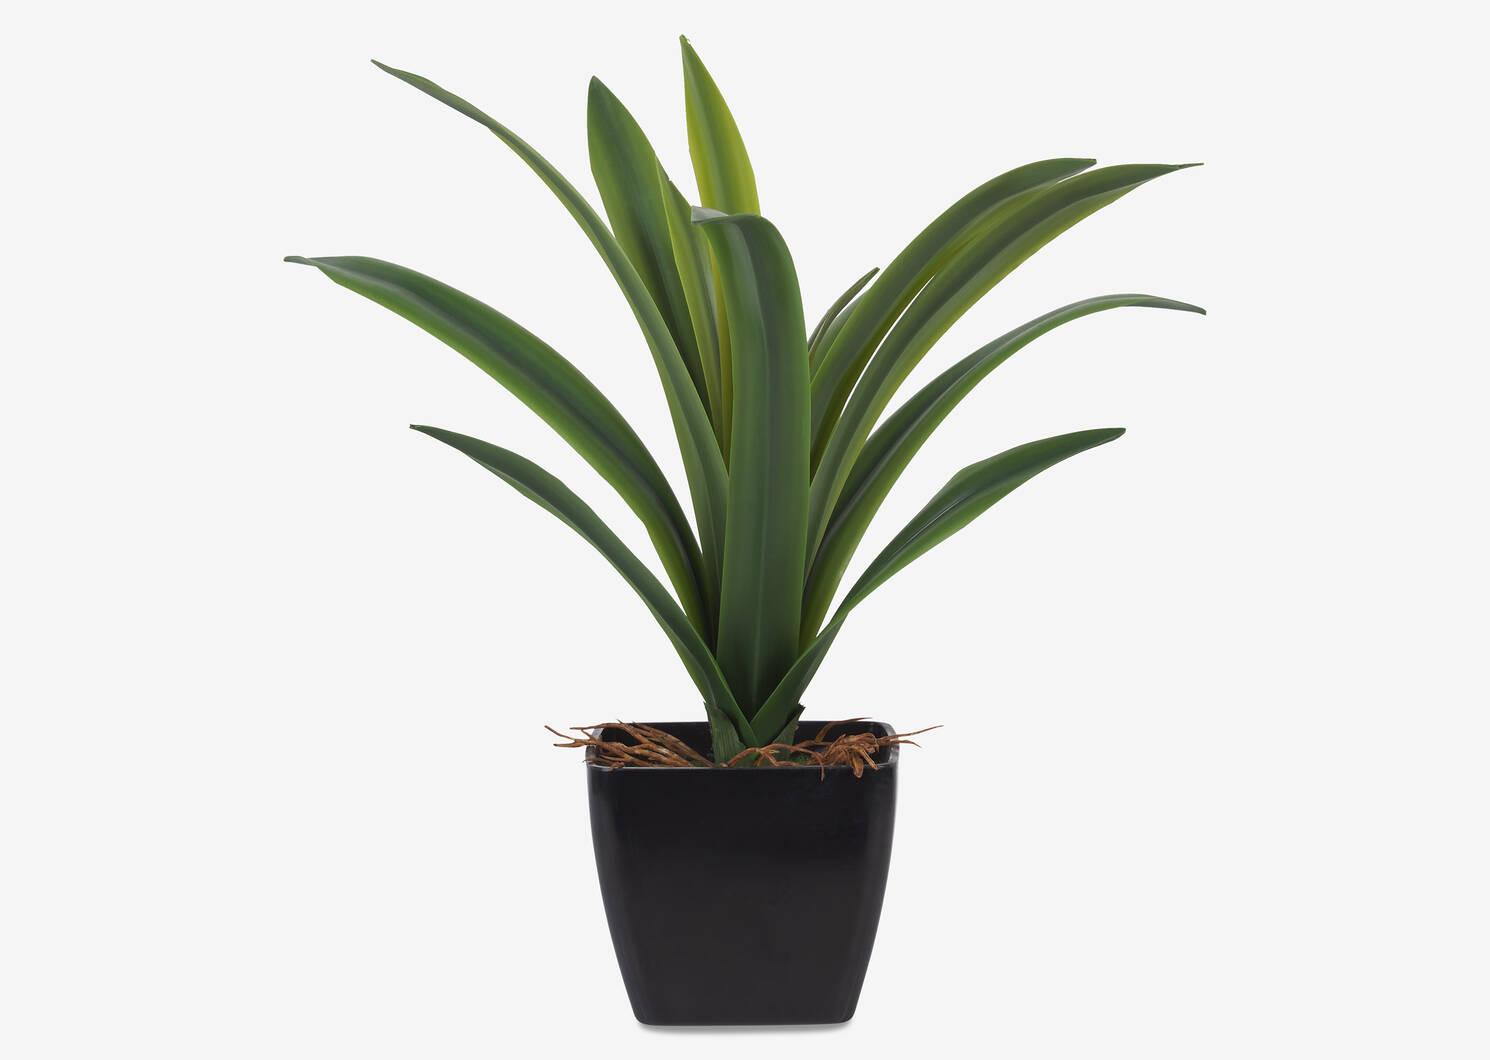 Colm Dracaena Plant Potted